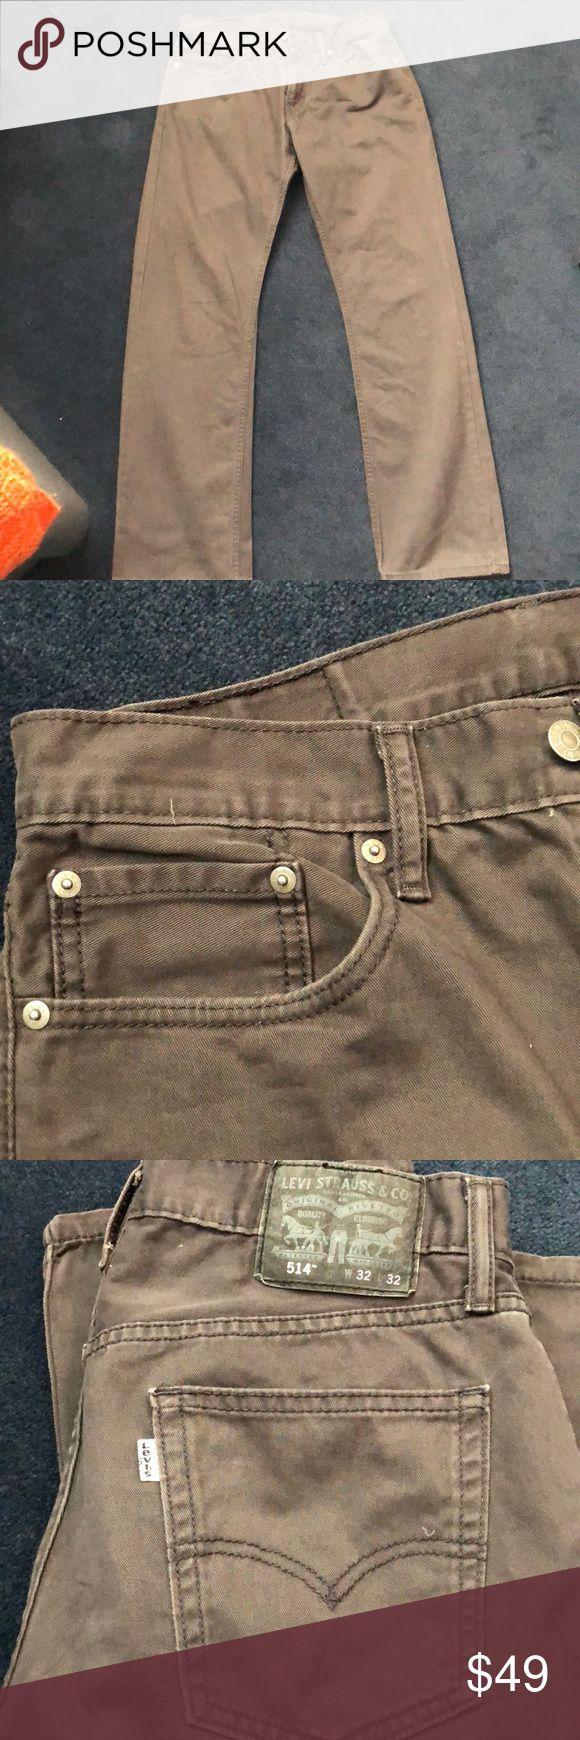 Levi 514 Mens Pants / Jeans - 32x32 - Dark Grey Gently worn - Levi 514 Mens Pants / Jeans - 32x32 - Dark Grey Levi's Pants Chinos & Khakis